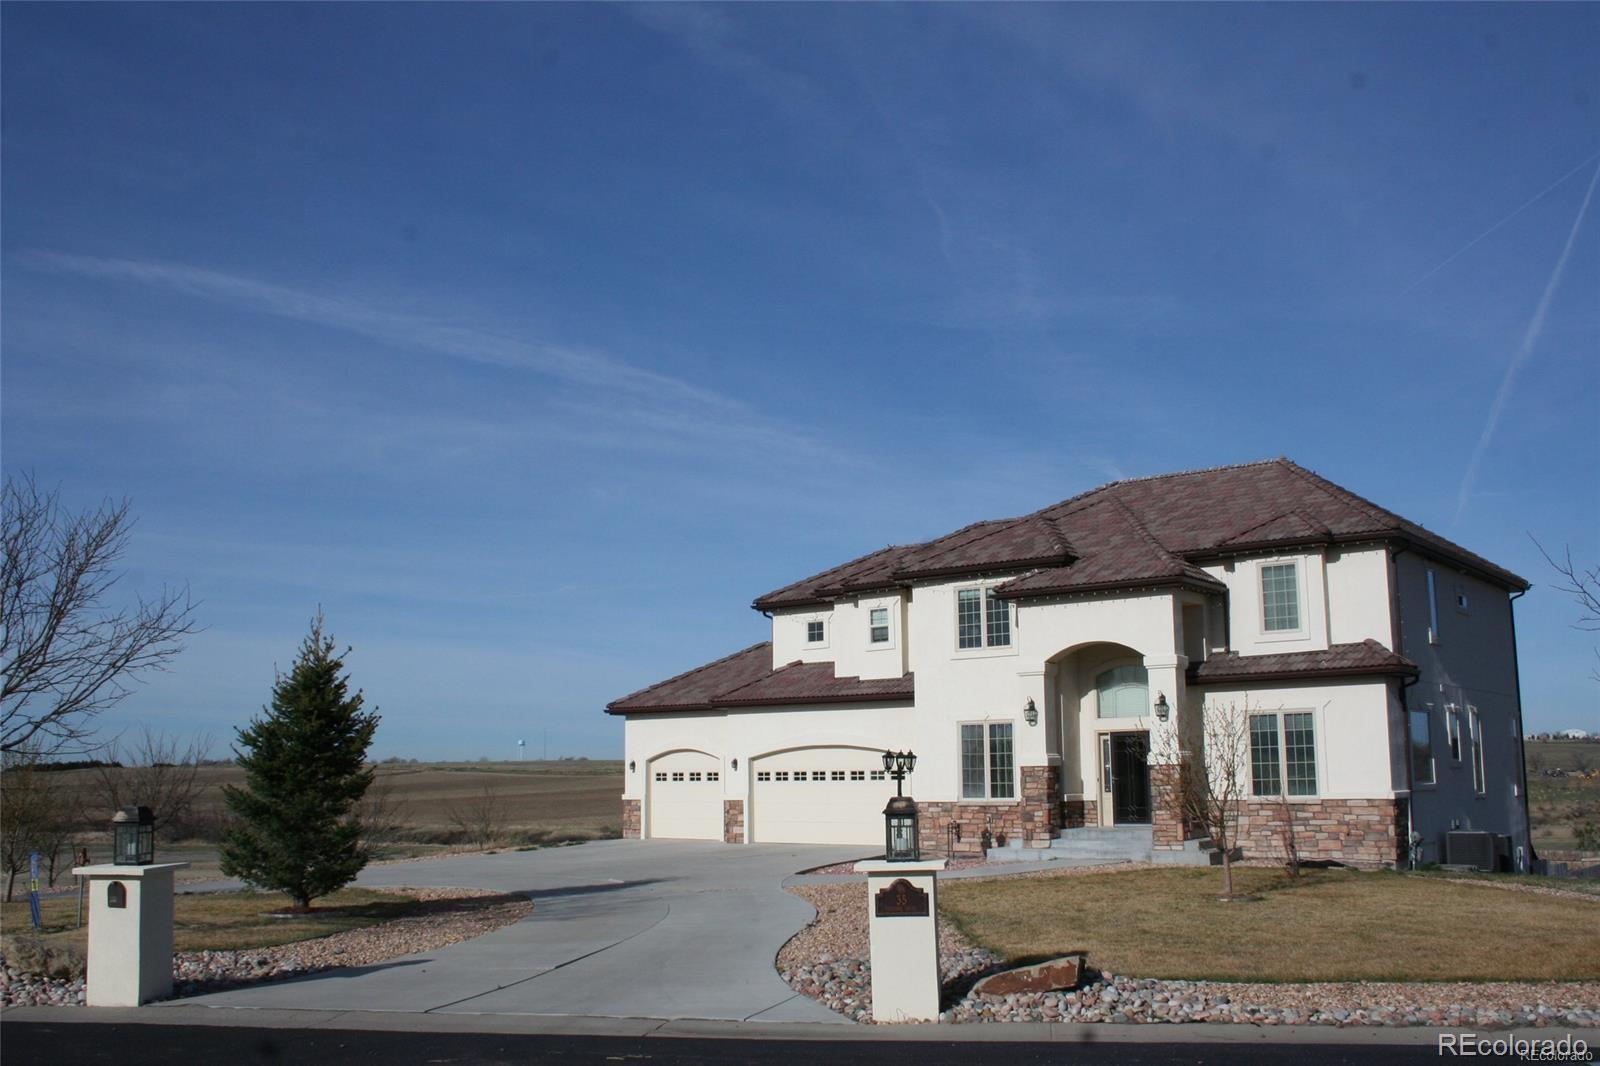 35 Preserve Drive, Fort Morgan, CO 80701 - Fort Morgan, CO real estate listing